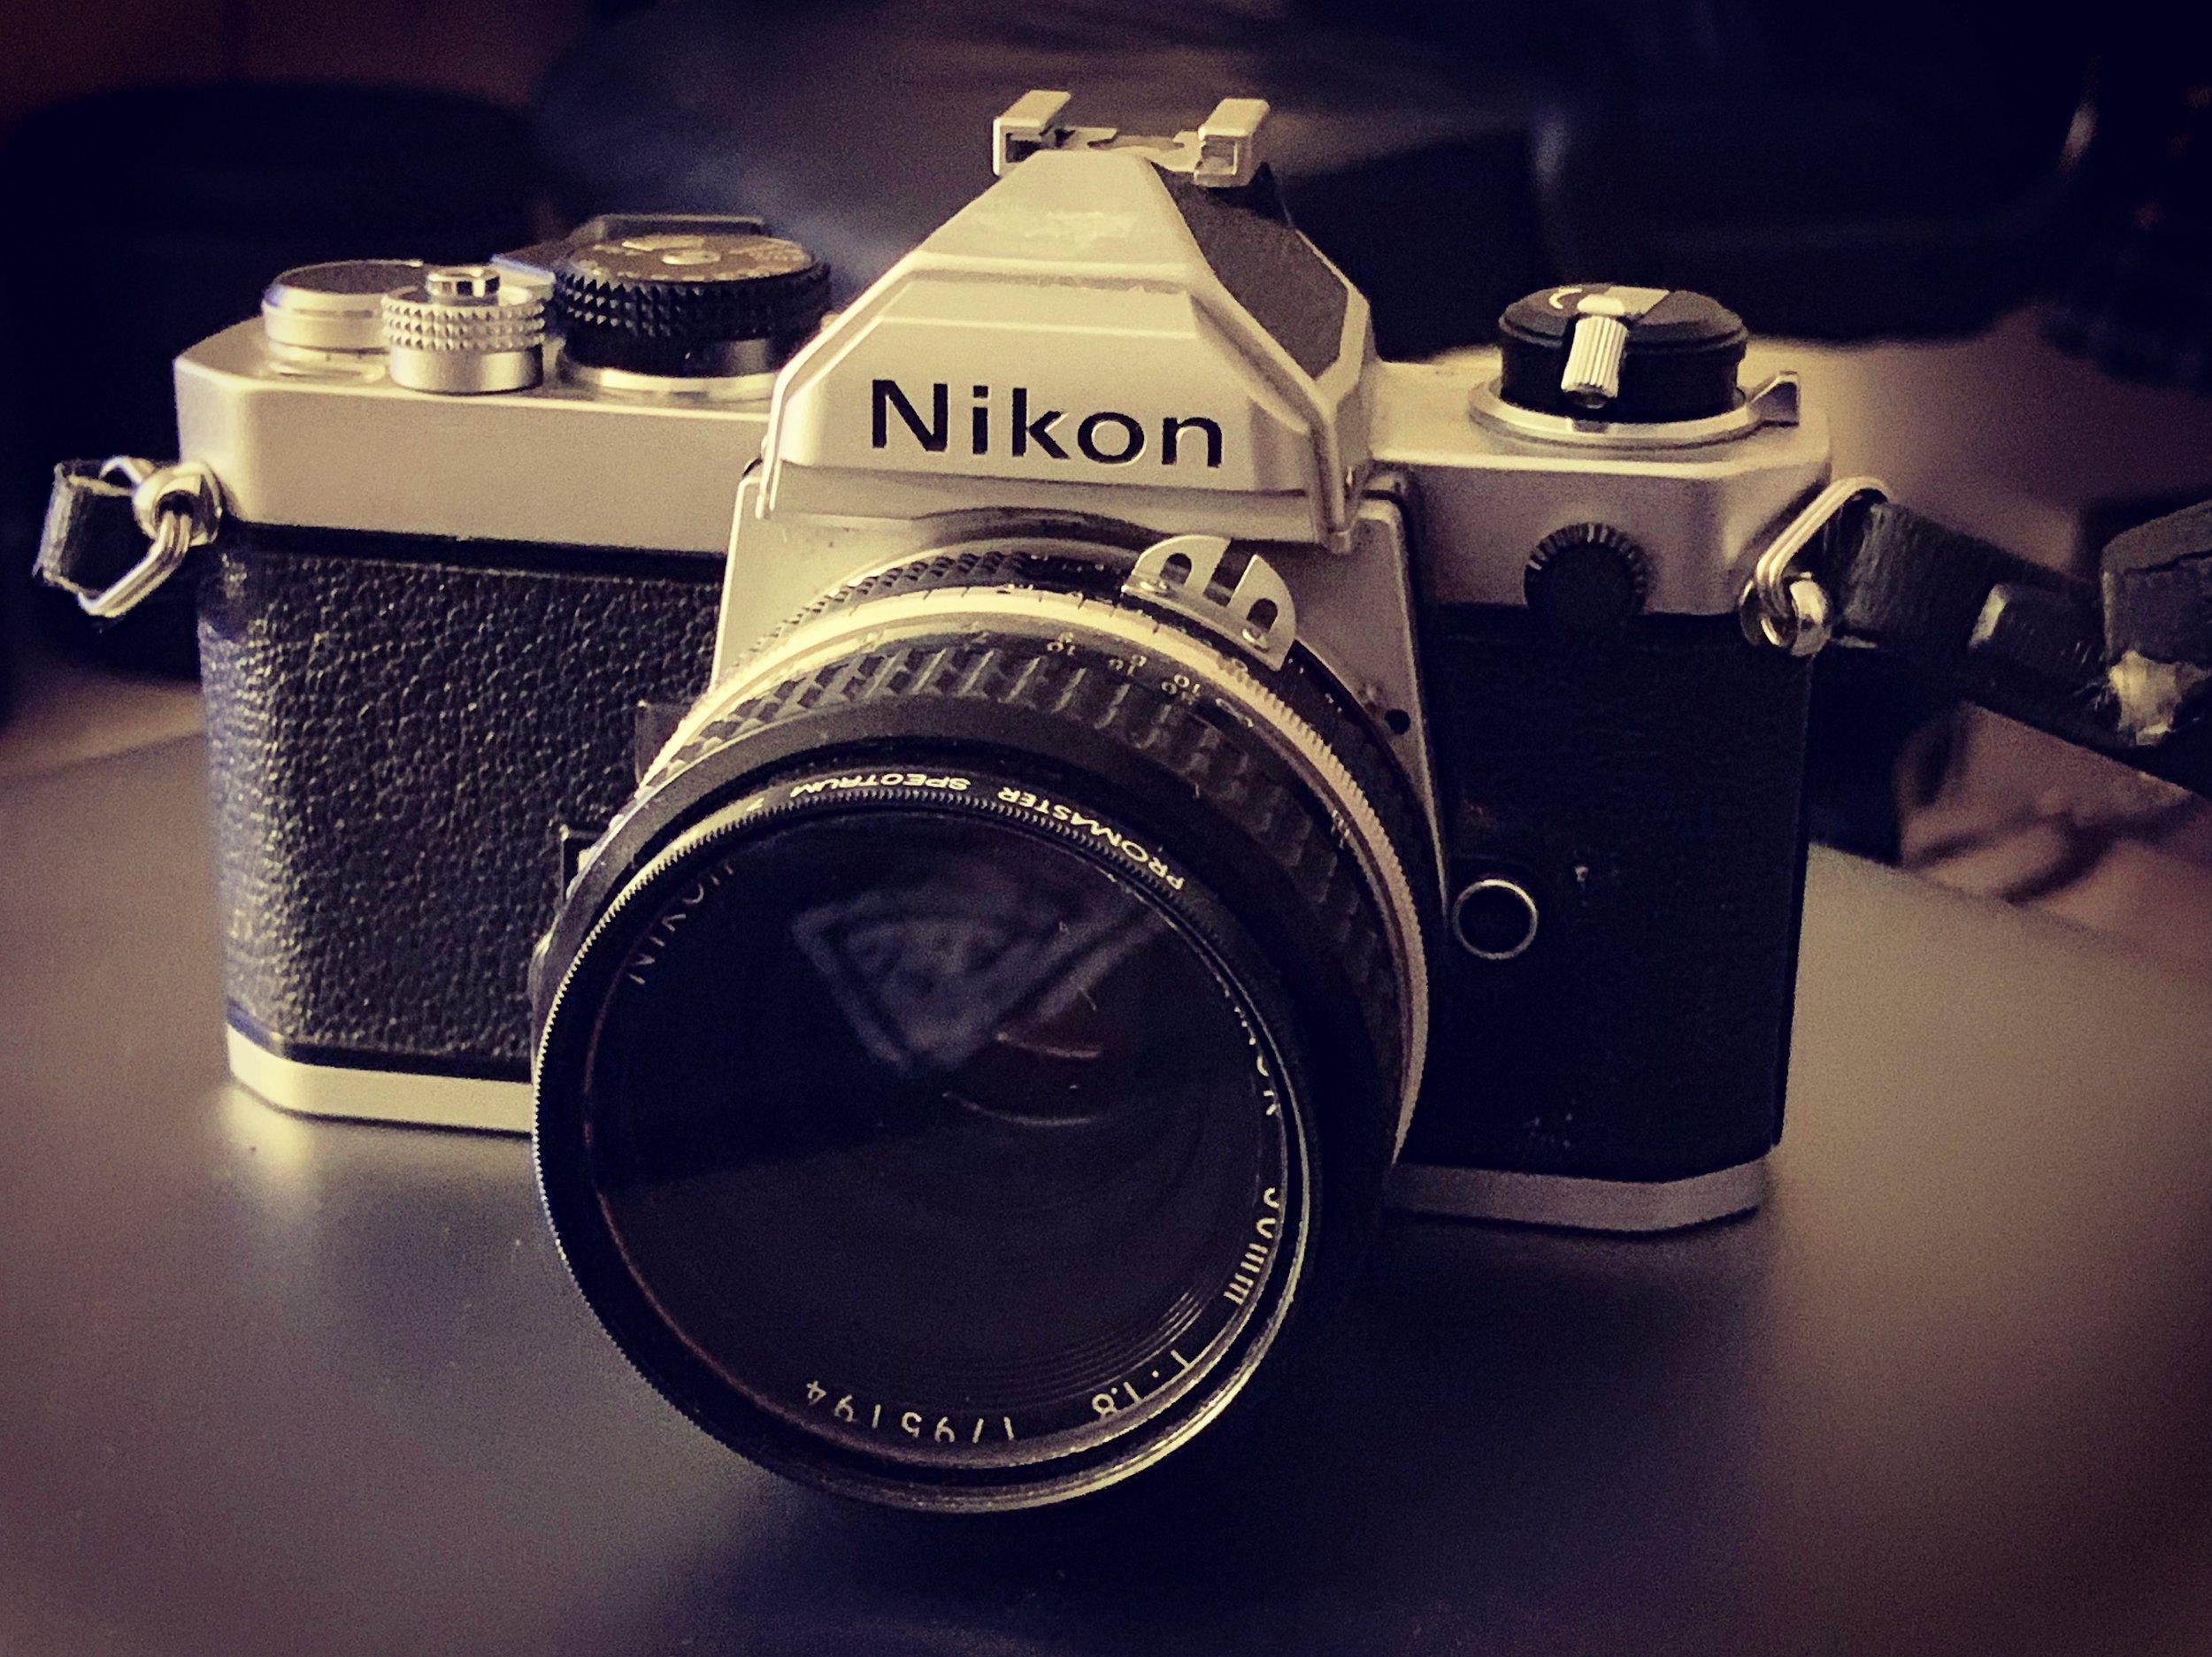 The Nikon FM